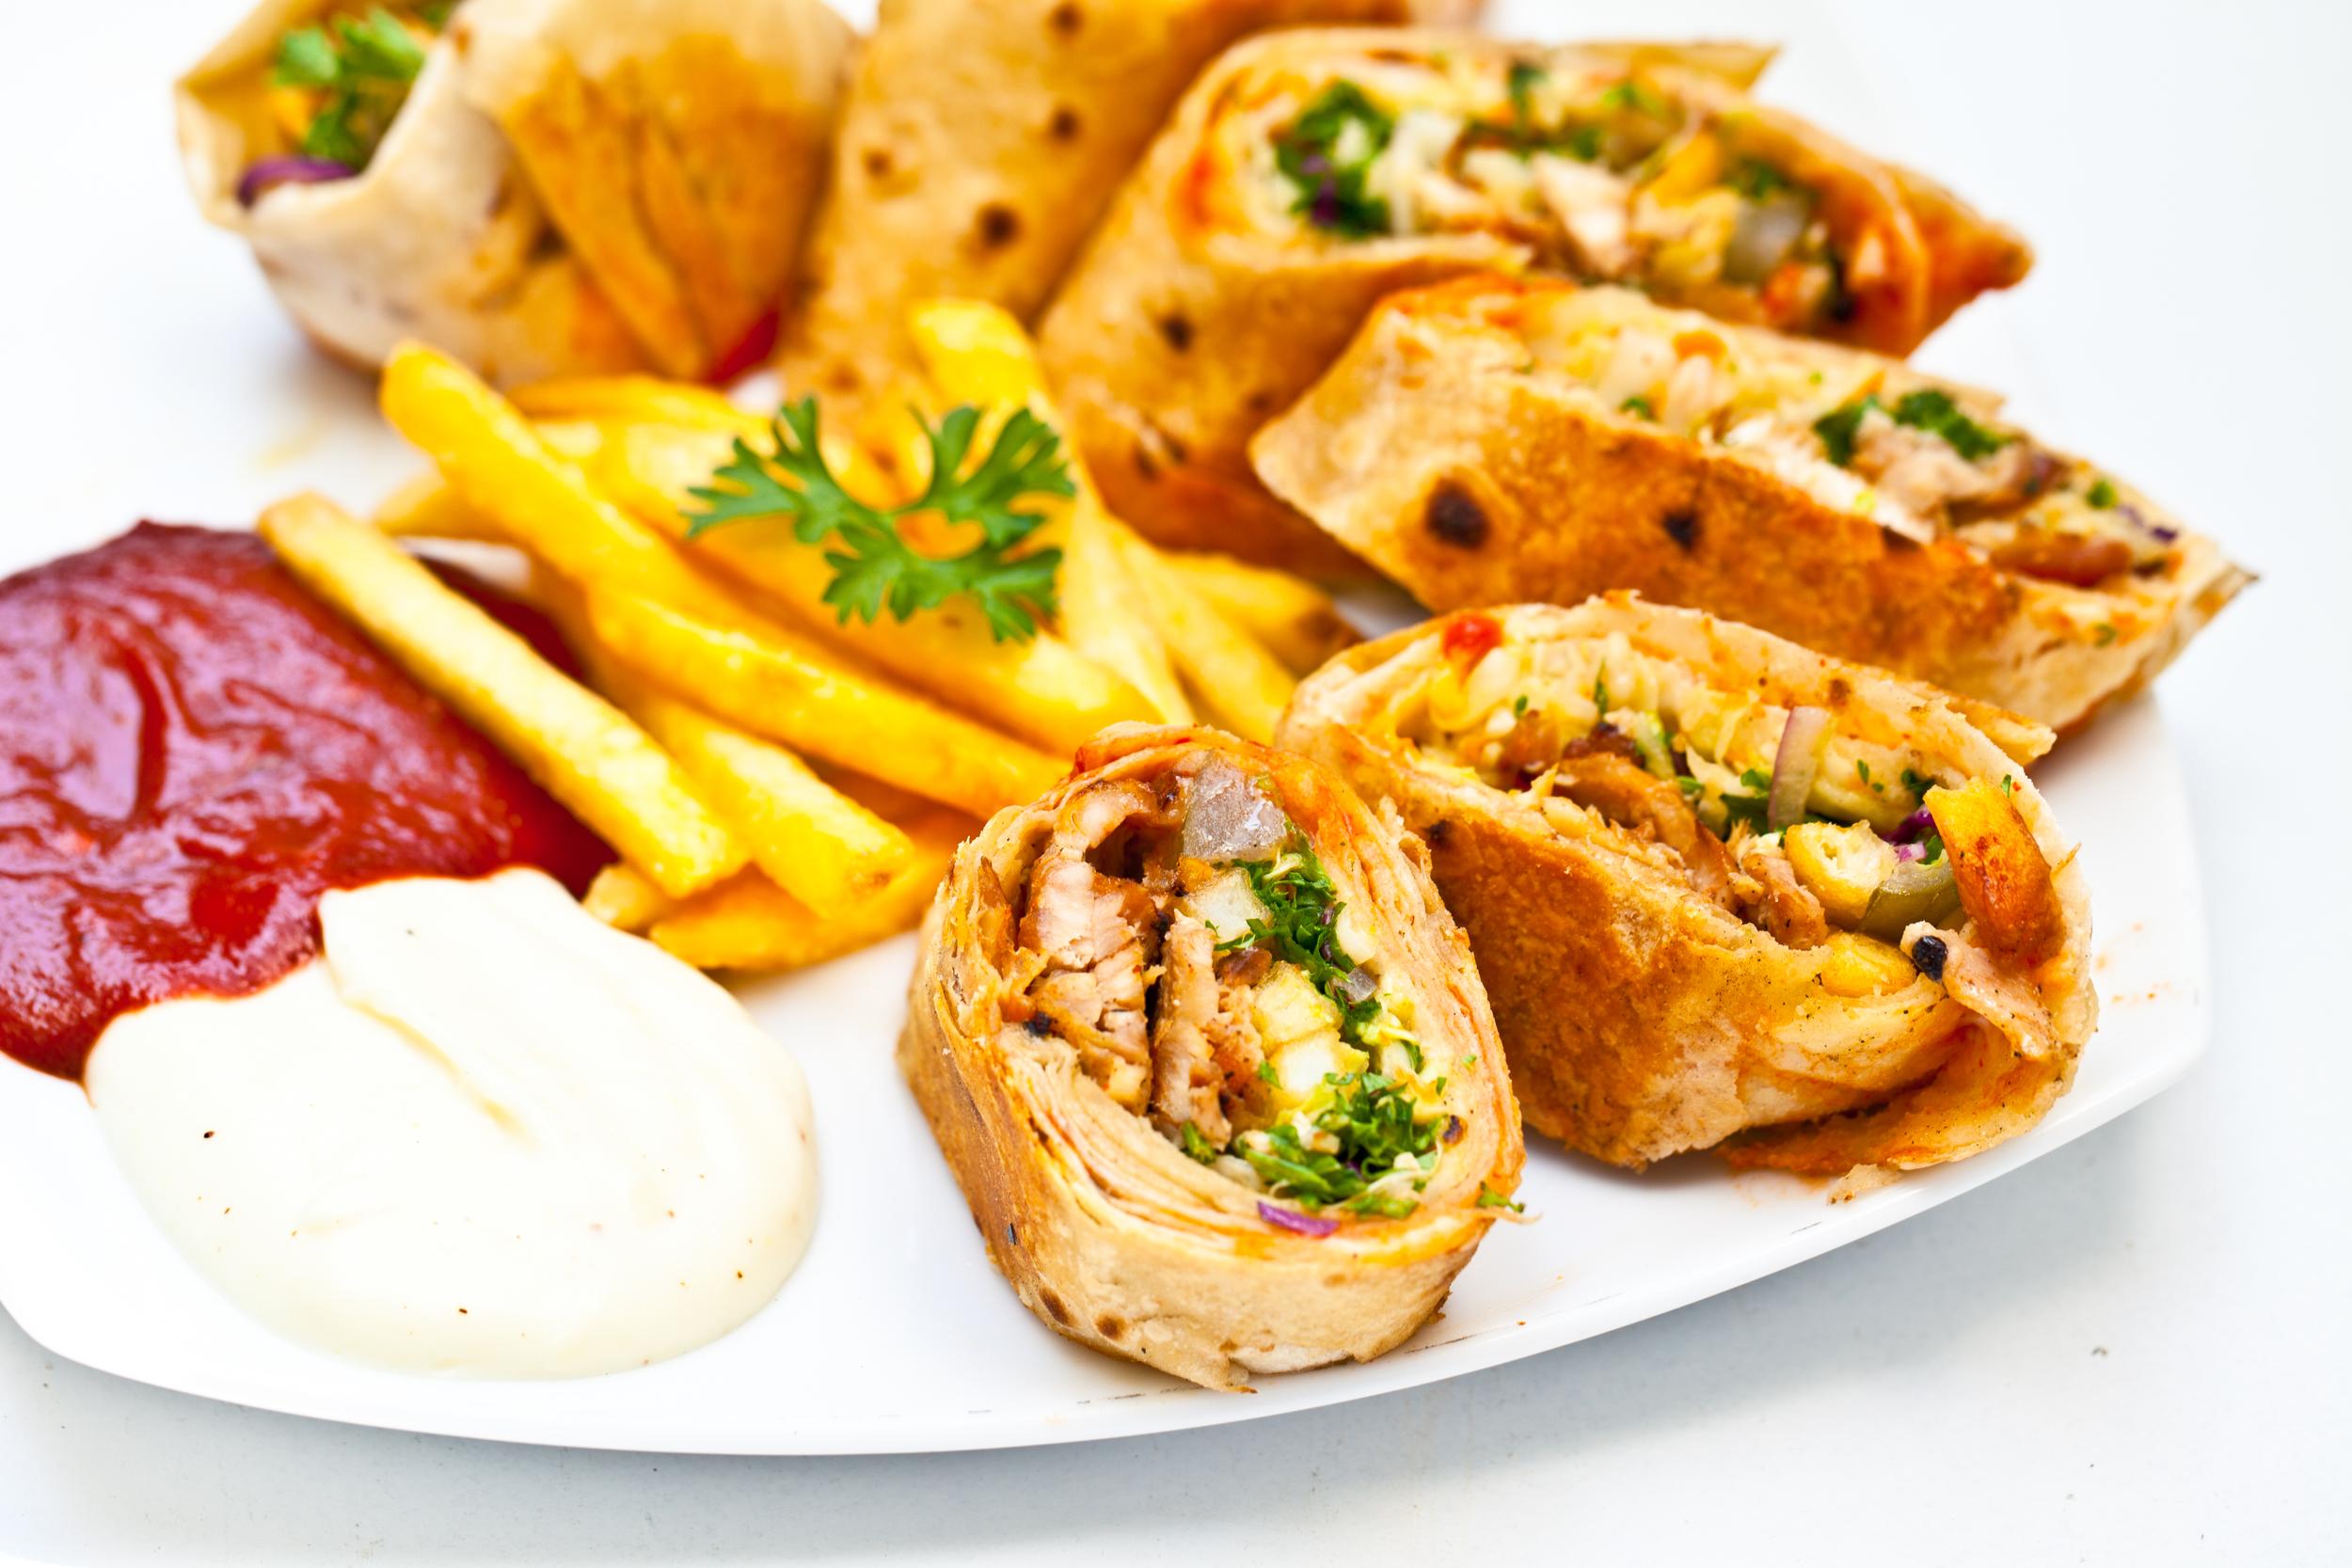 The Arabic Shawarma Plate